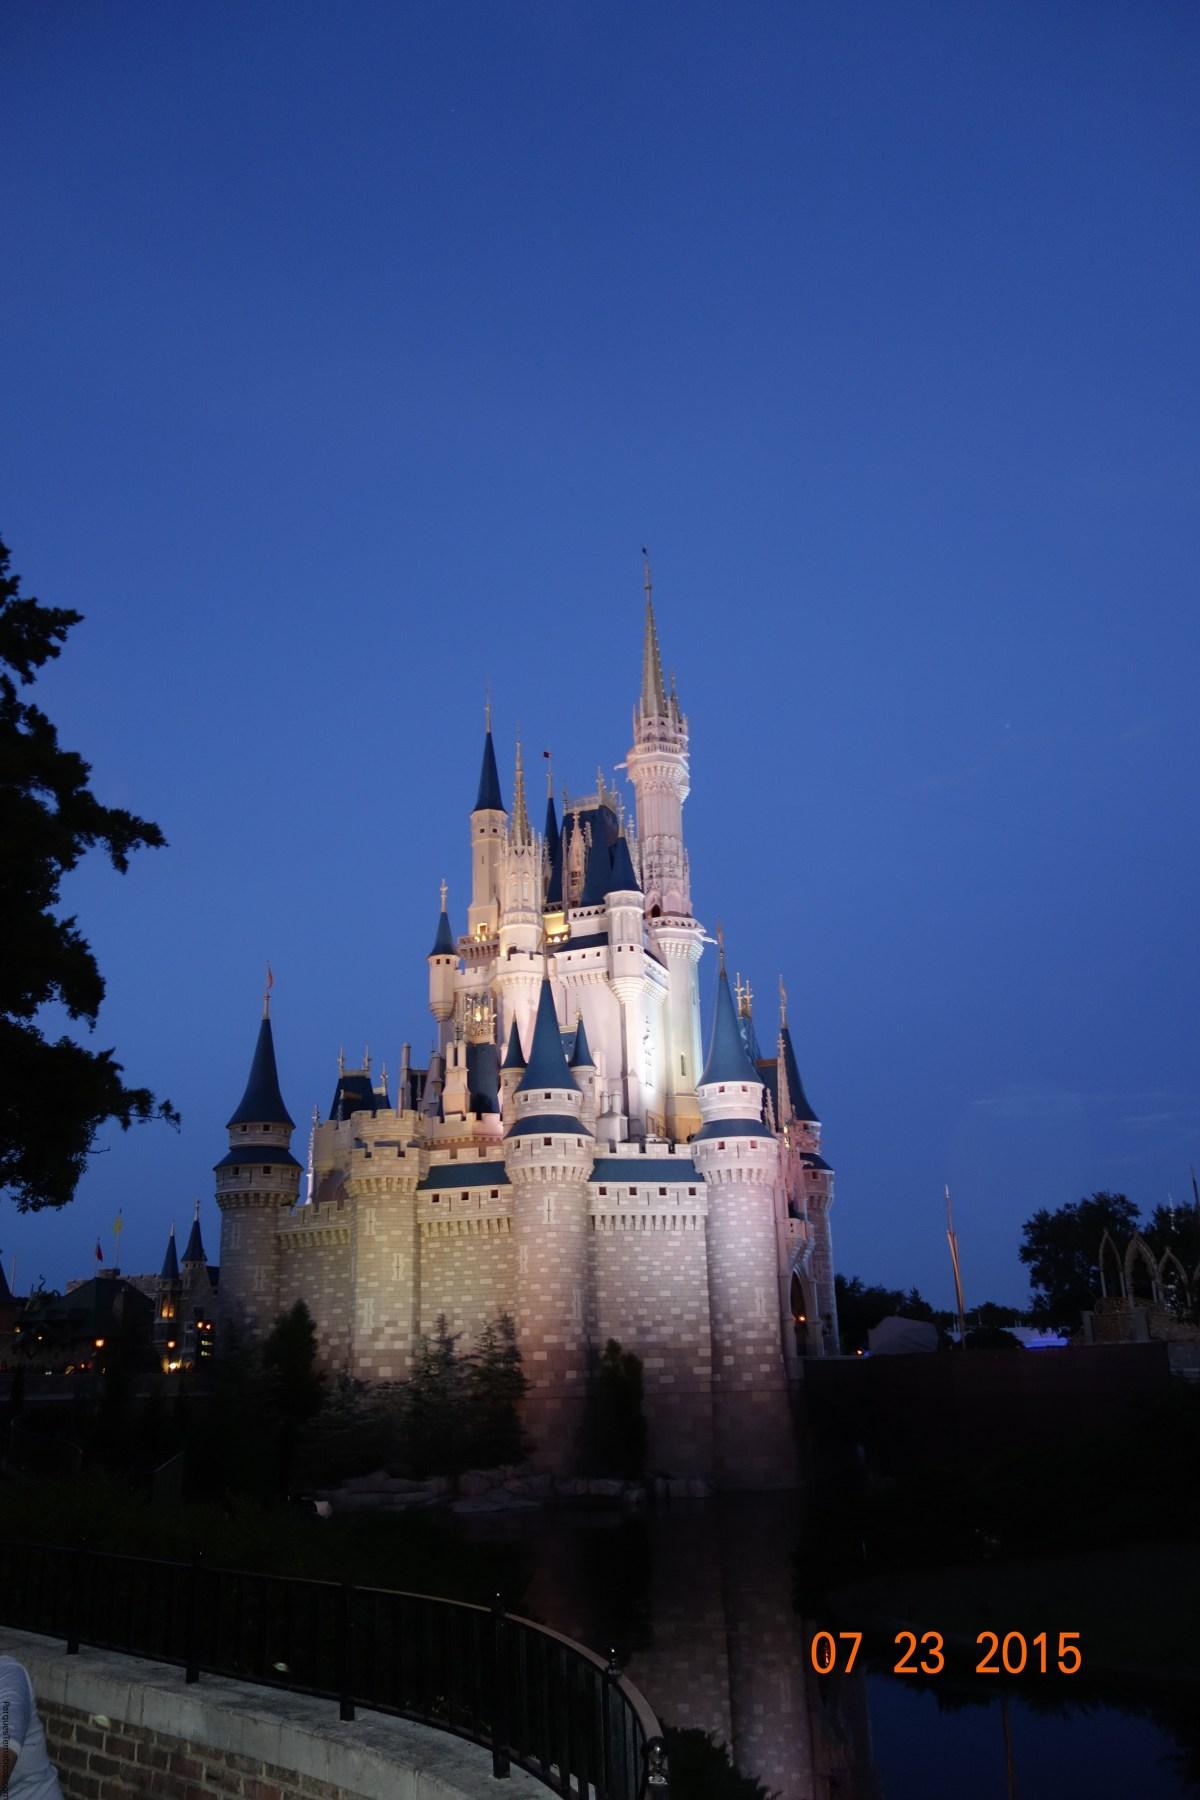 Bitácora de un viaje a Disney World, Día 1